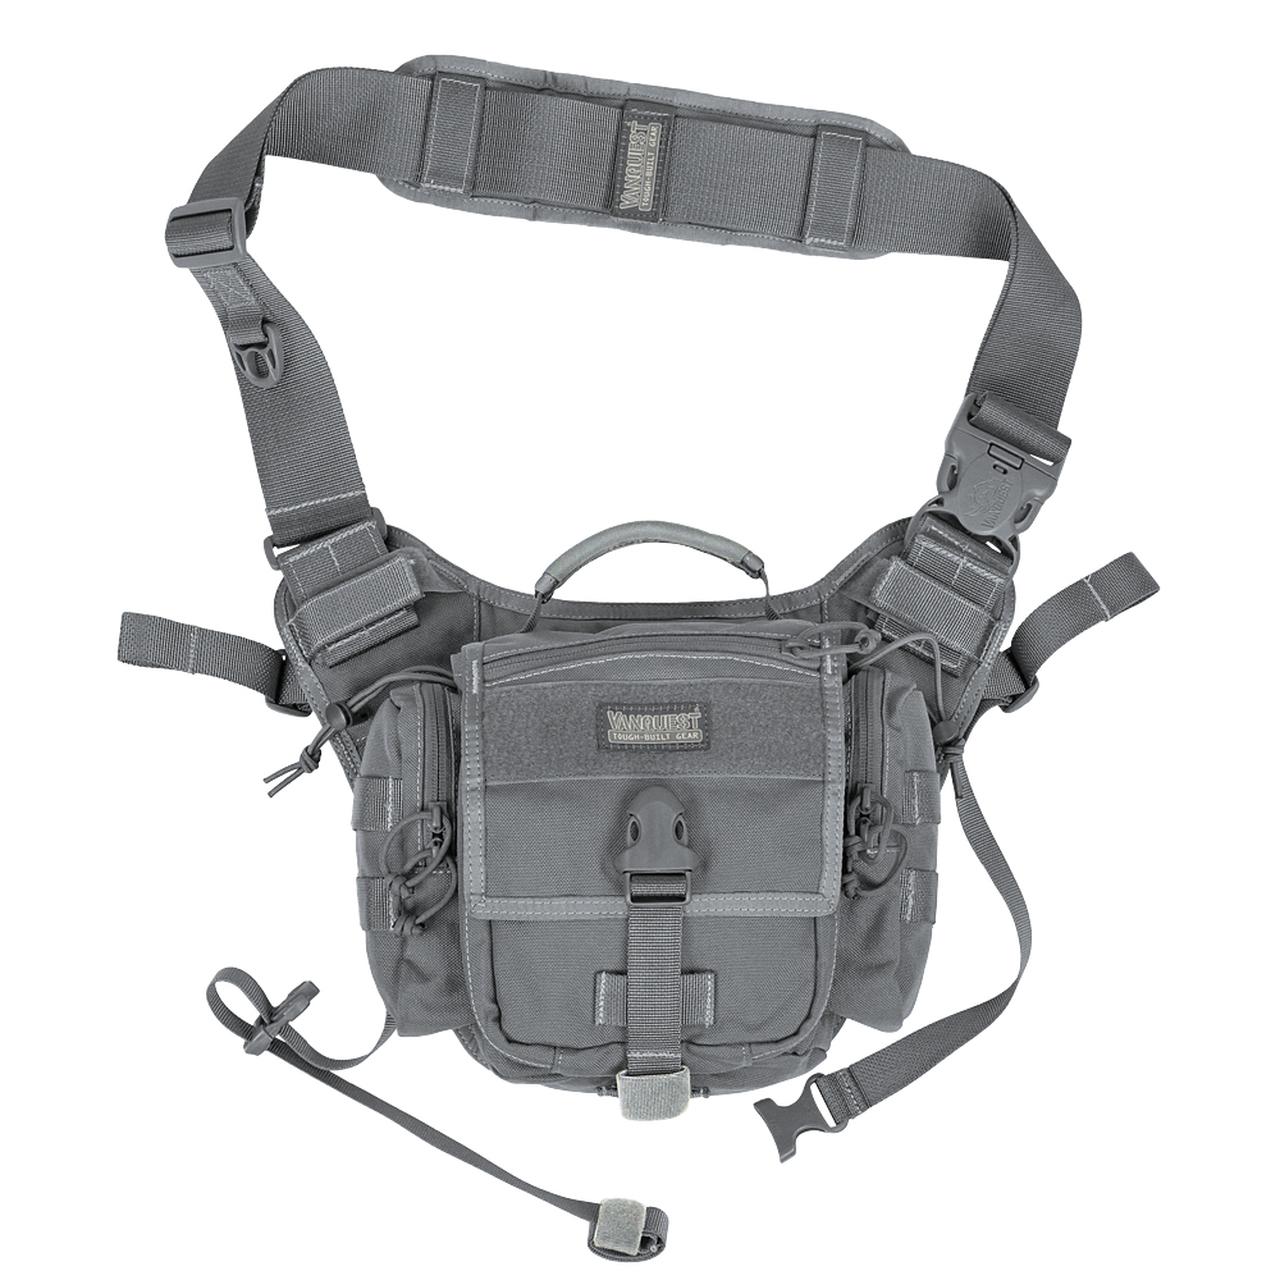 Túi VANQUEST TOLCAT 2.0 VPacker Gear Bag – Wolf Grey